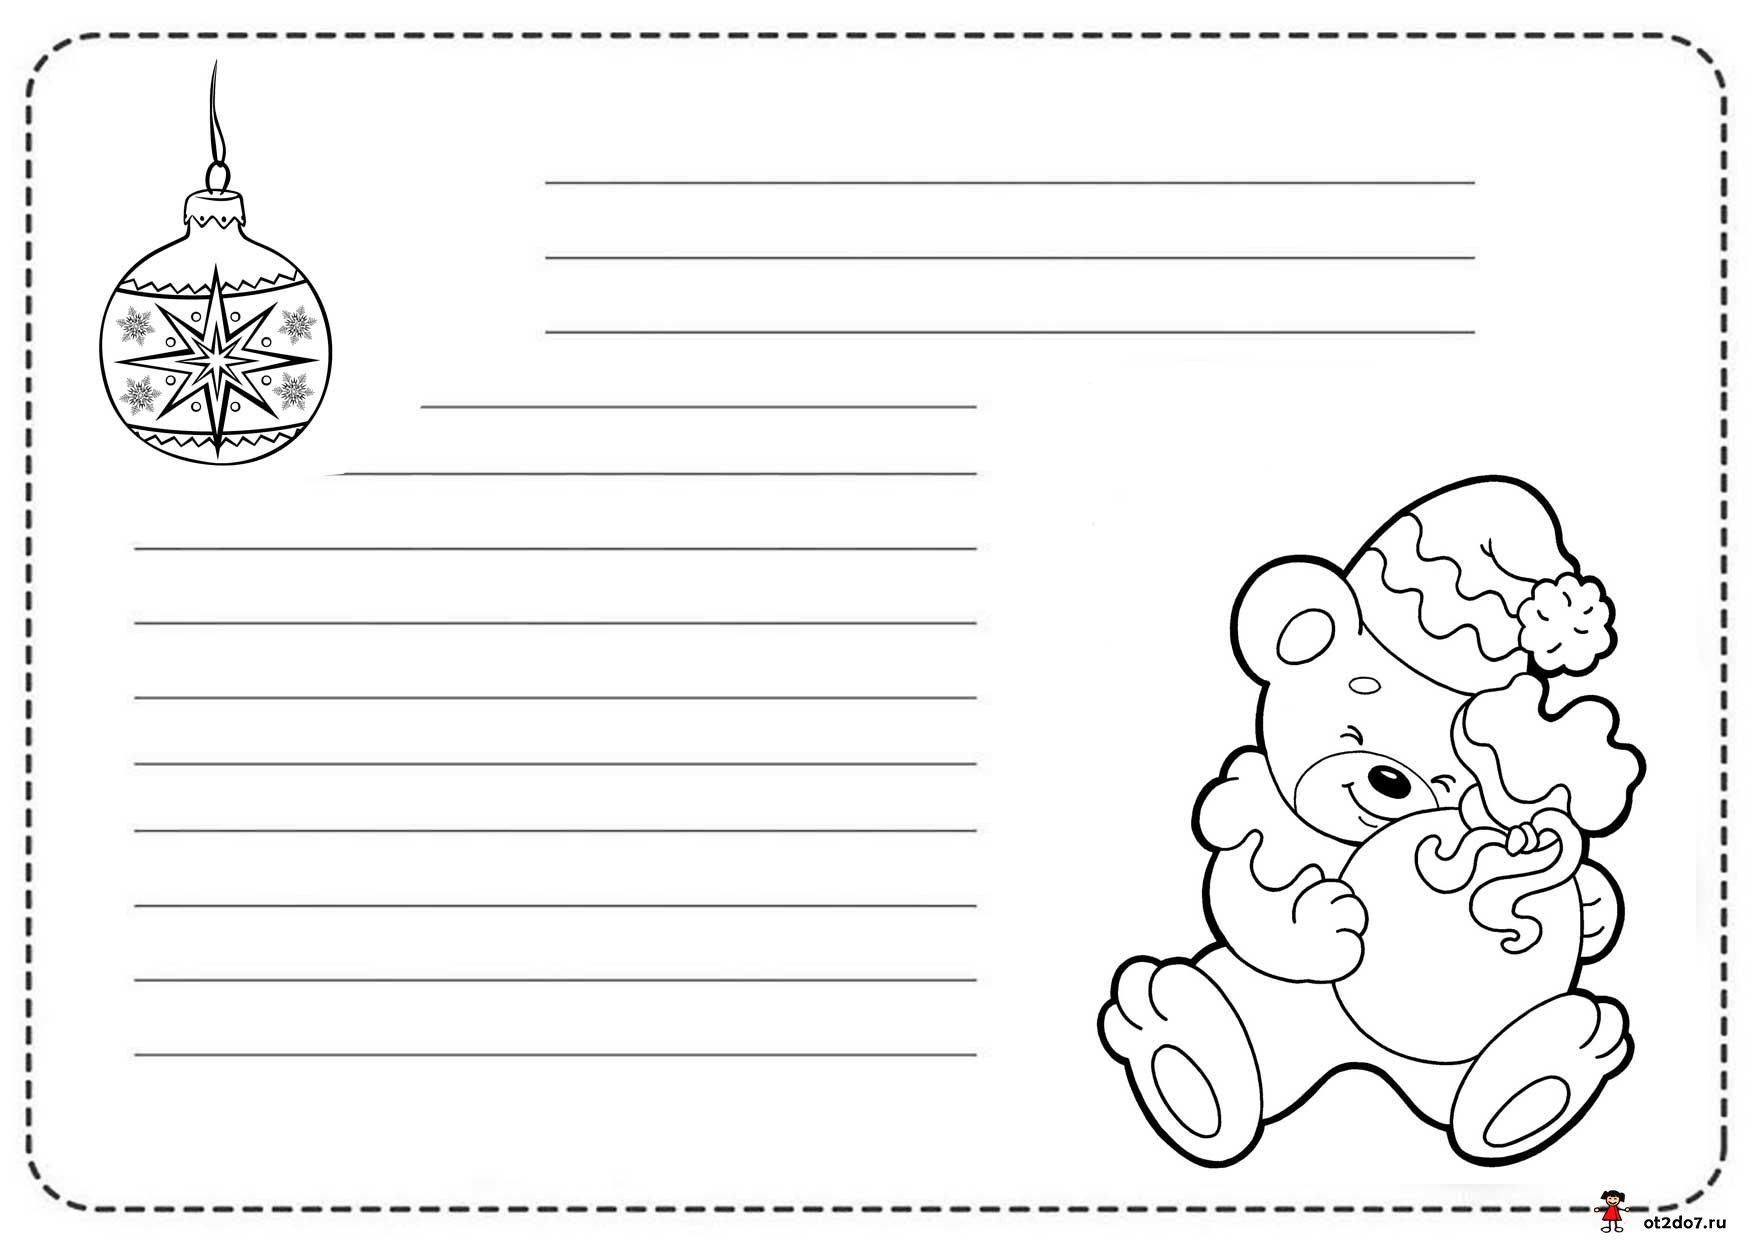 Раскраска письмо деду морозу шаблон